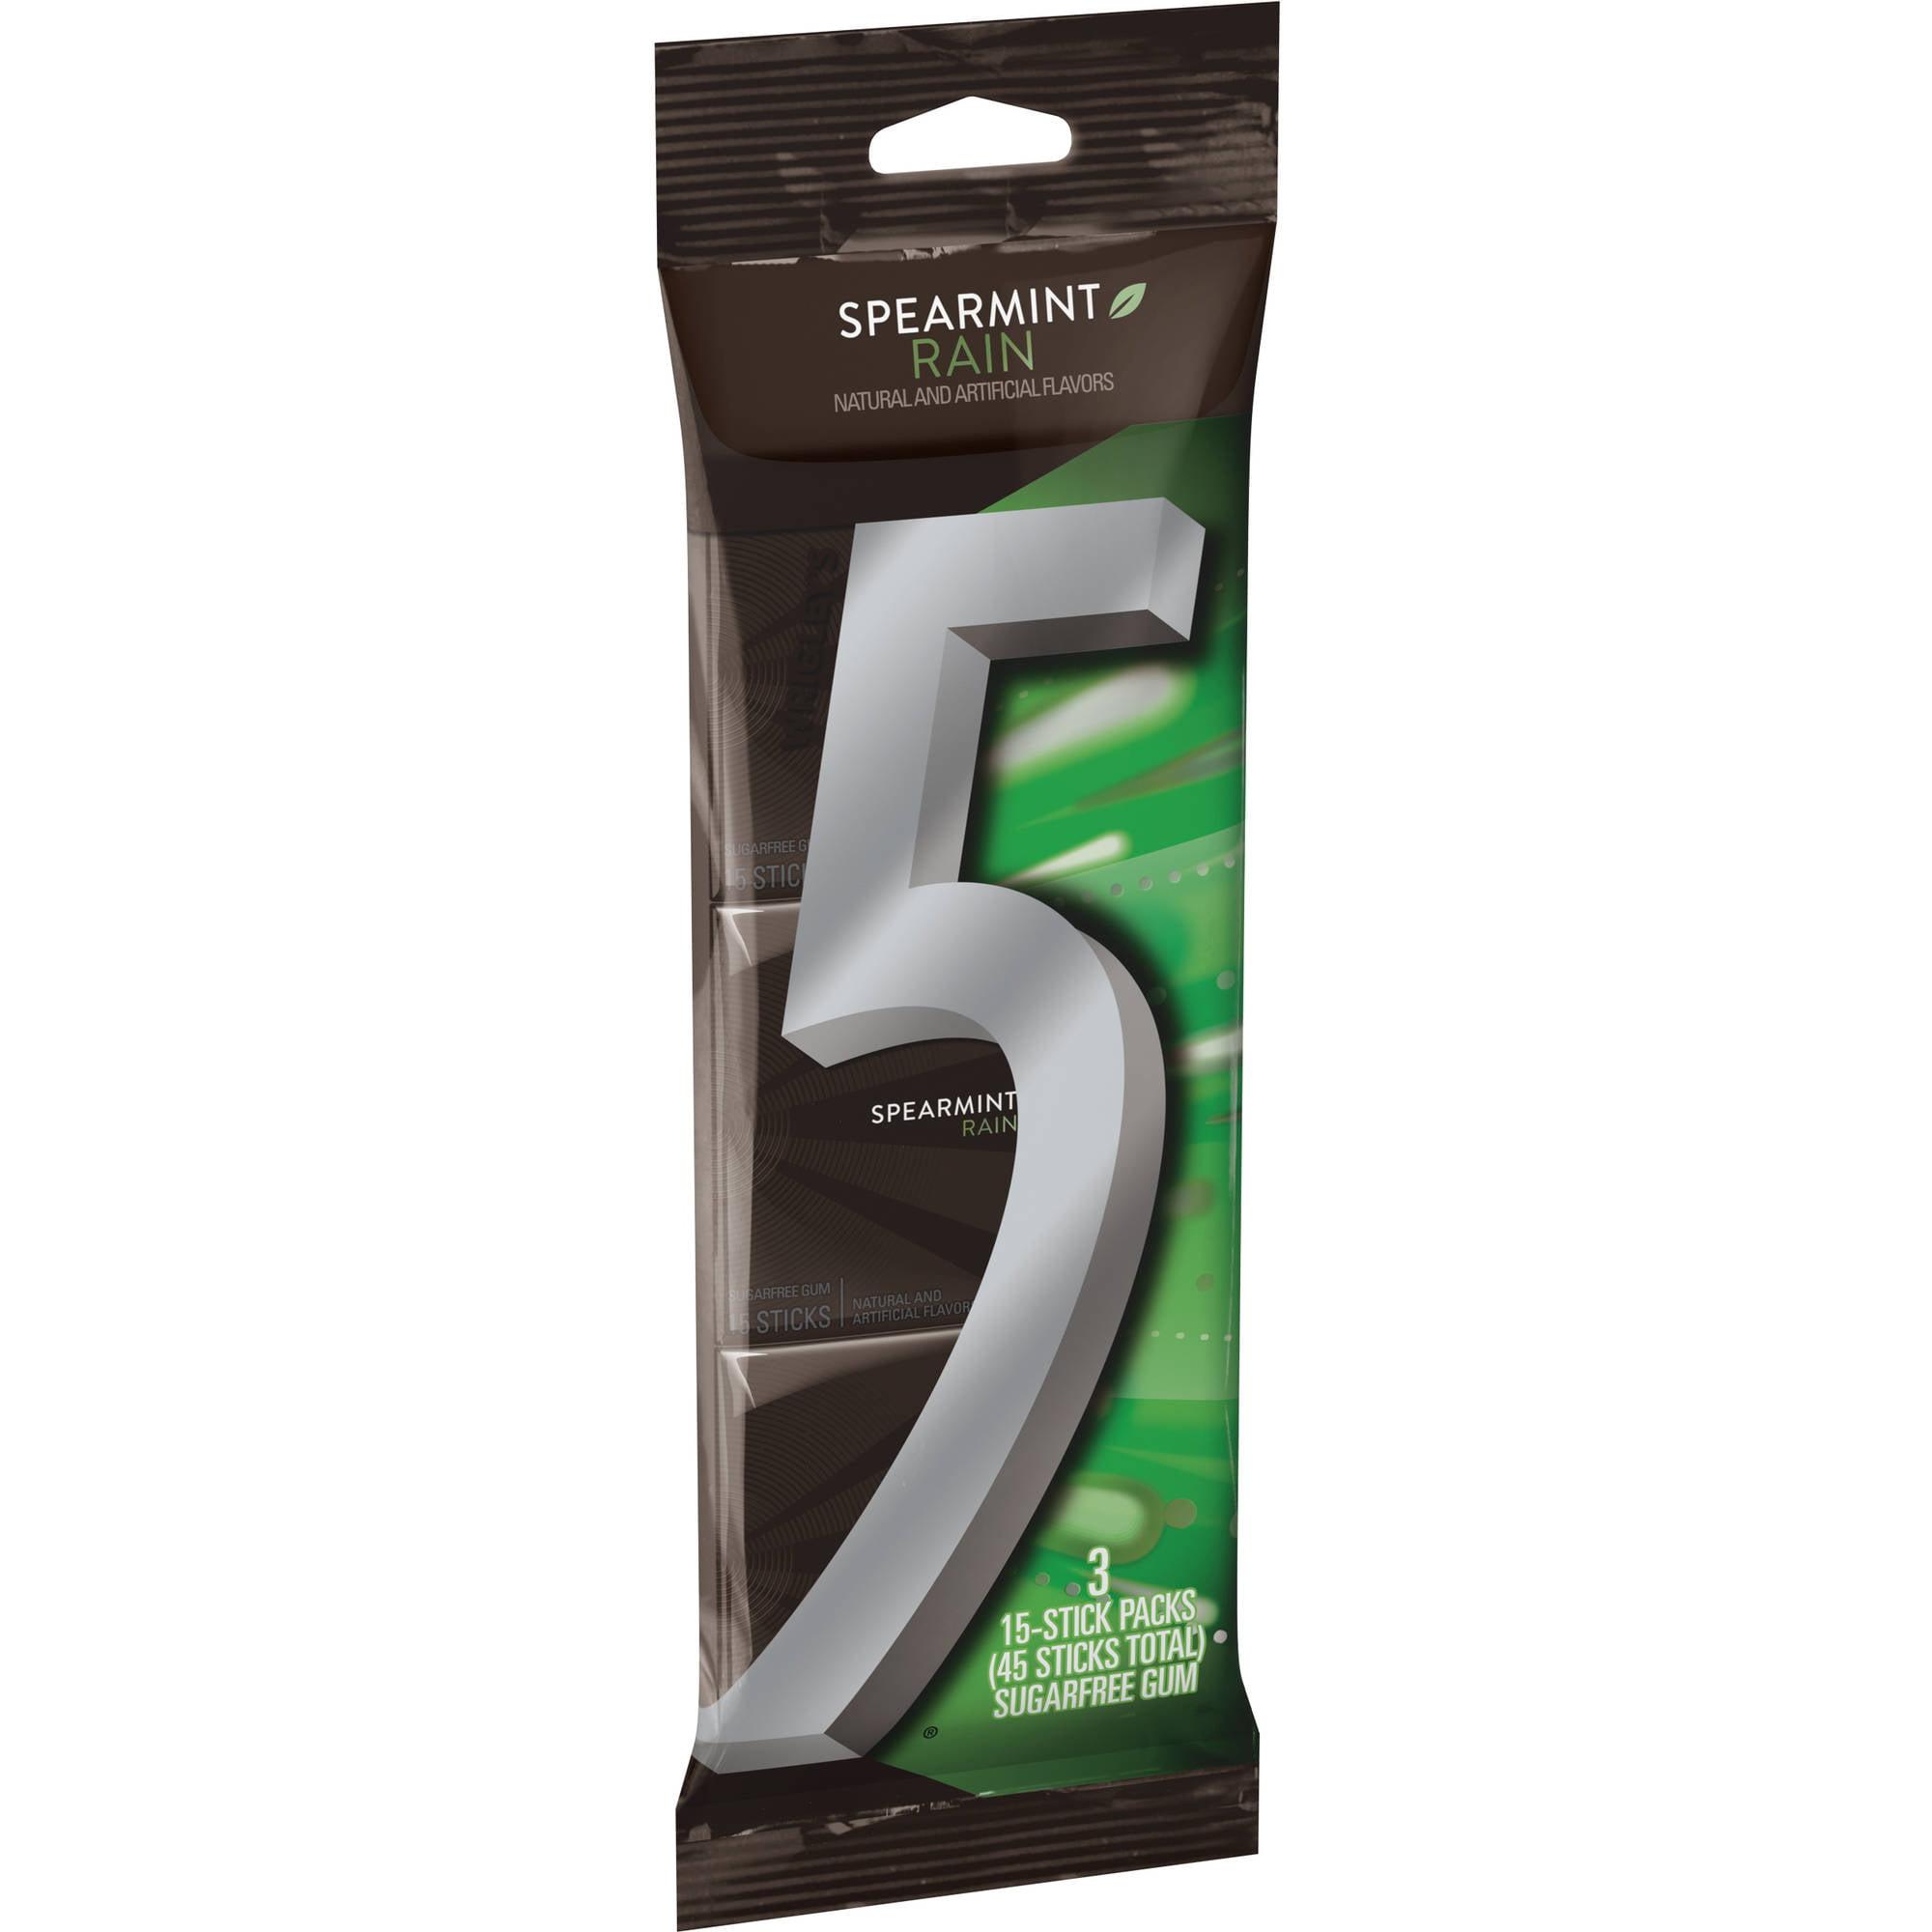 Wm. Wrigley Jr. Company 5 Gum Spearmint Rain Sugarfree Gum, Multipack (3 Packs Total)